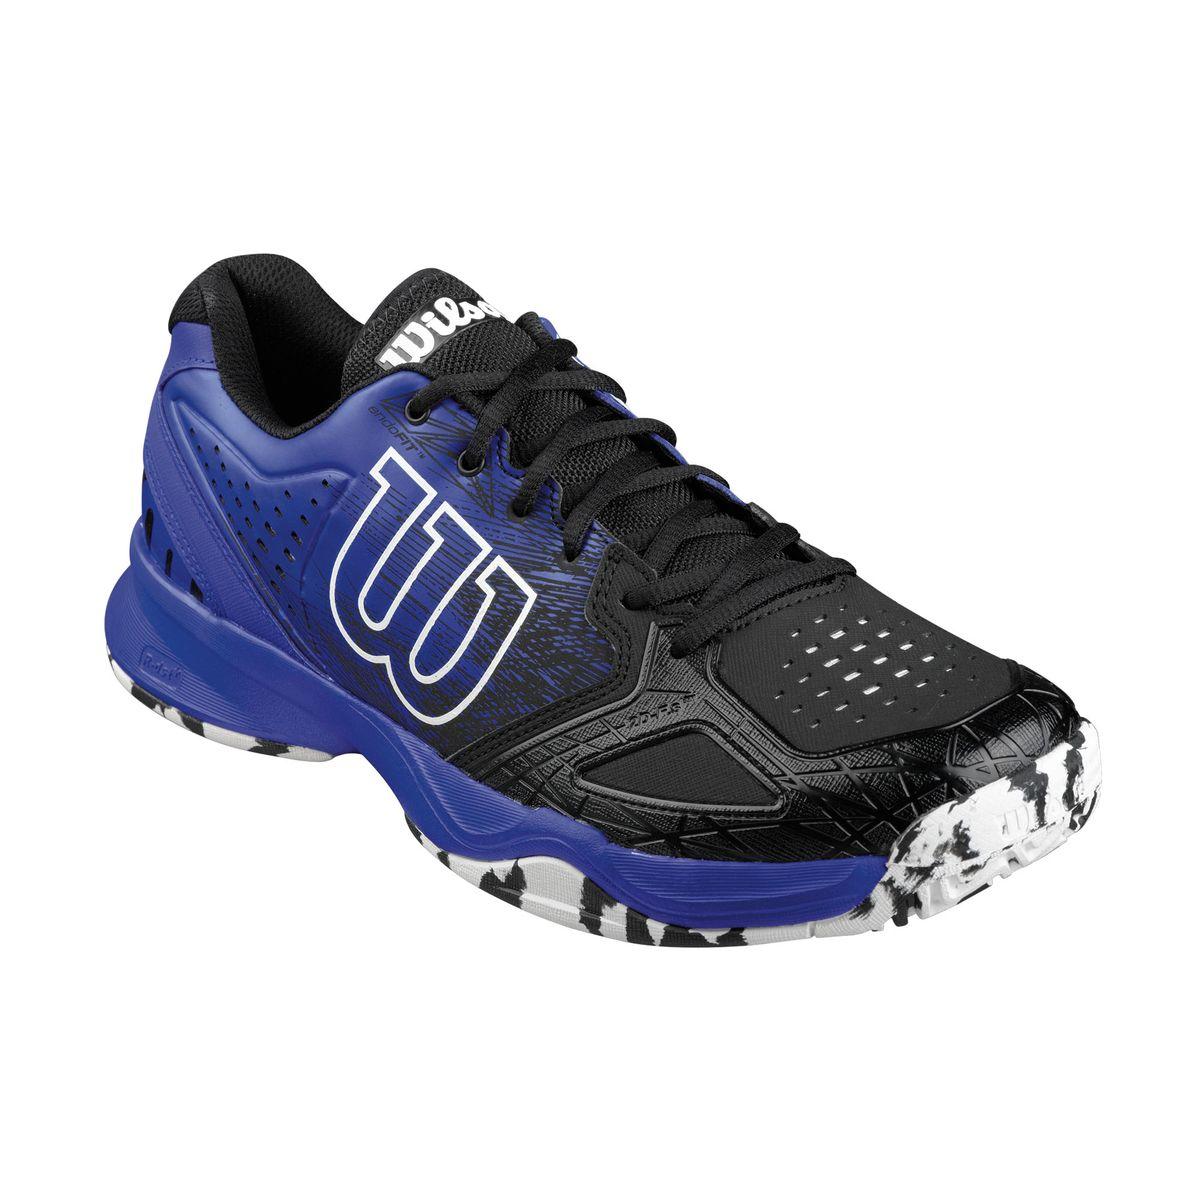 Кроссовки для тенниса муж. KAOS COMP. WRS321240